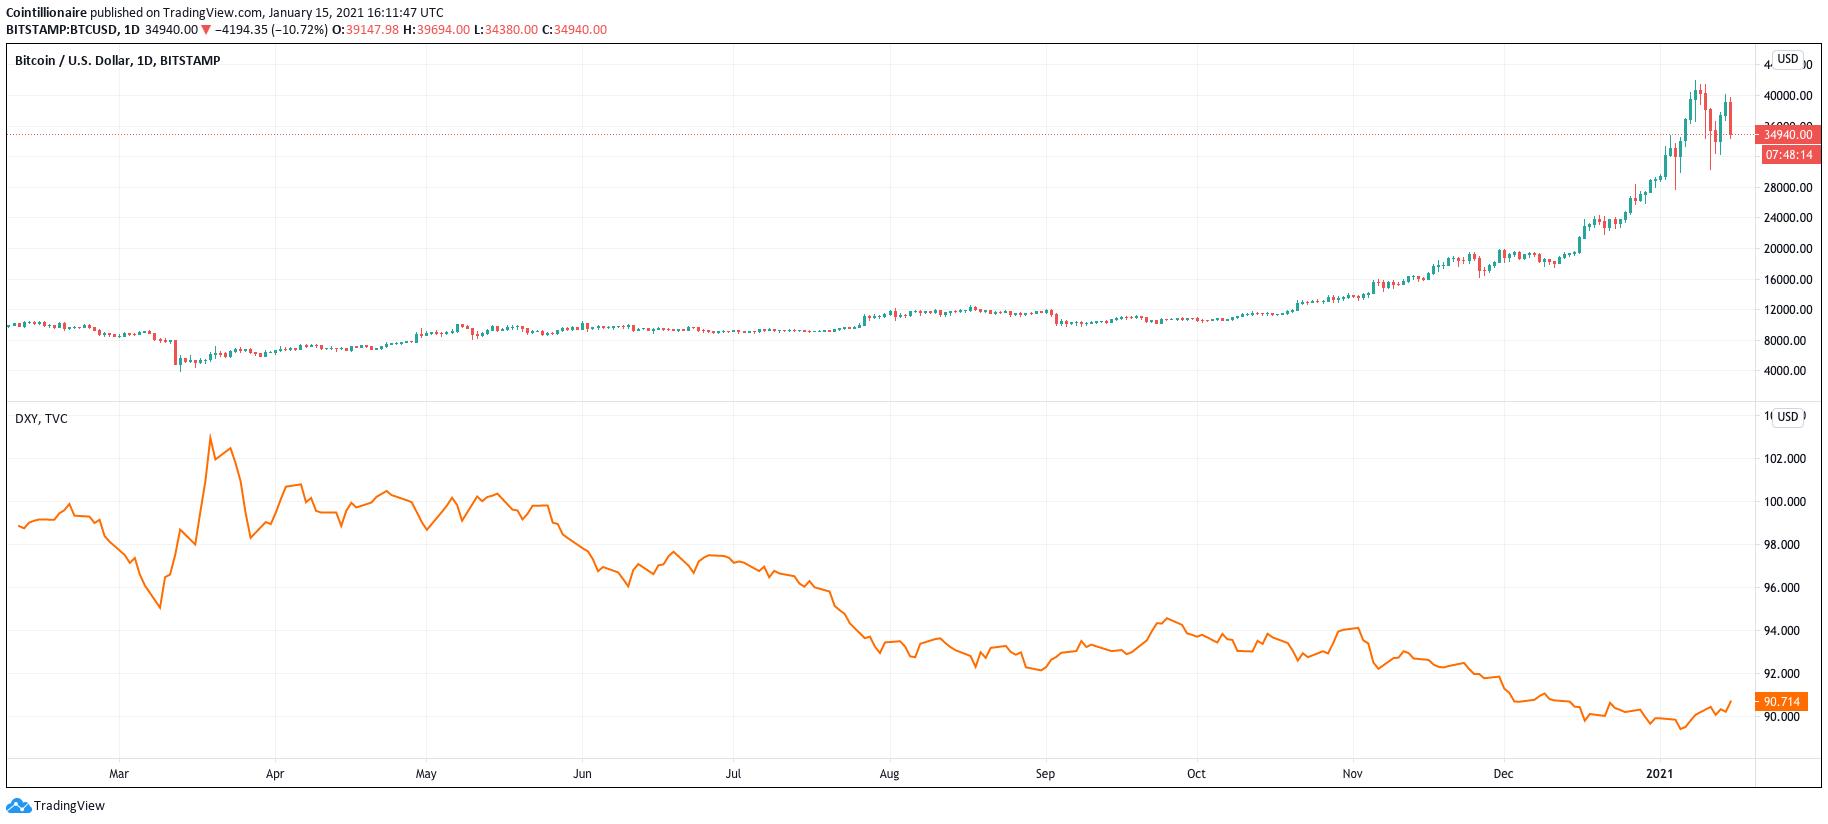 BTC/USD (Bitstamp) vs. DXY (arancione)